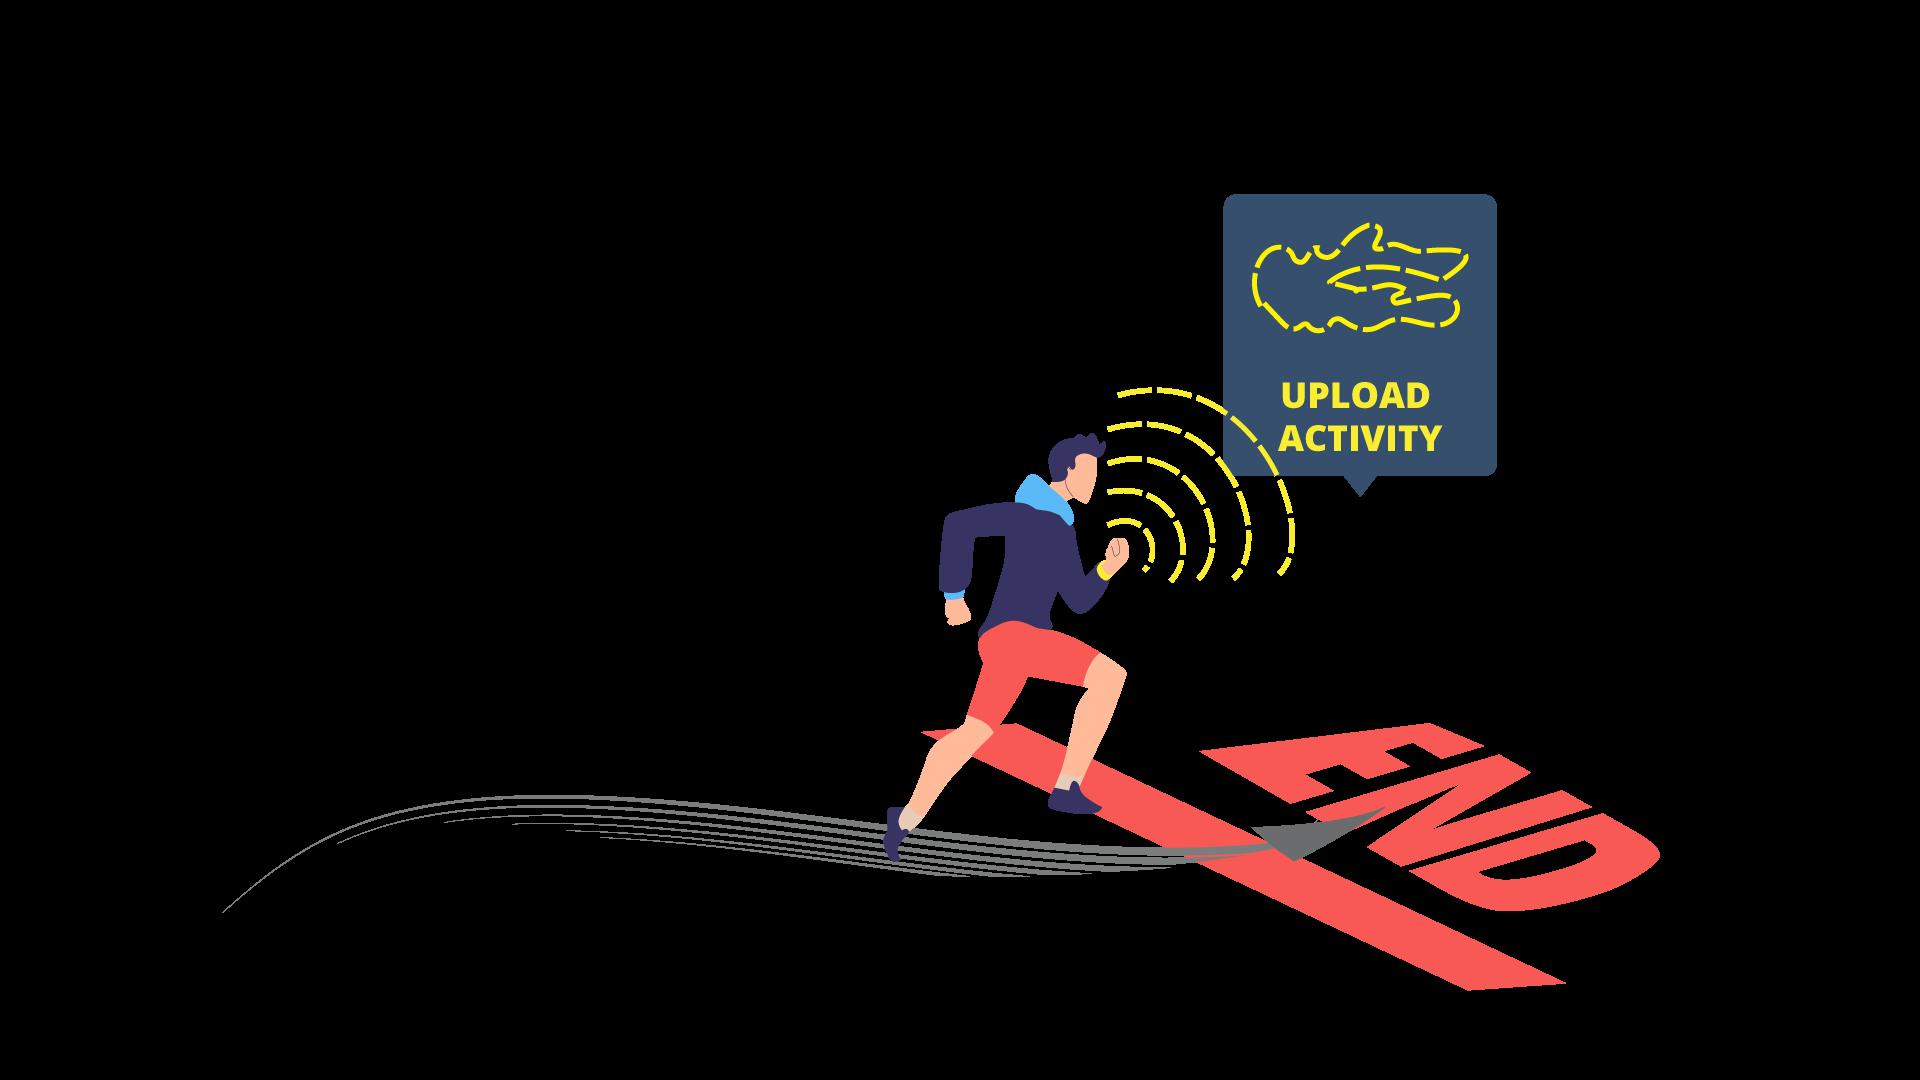 Deferred activity ranking / Leaderboard